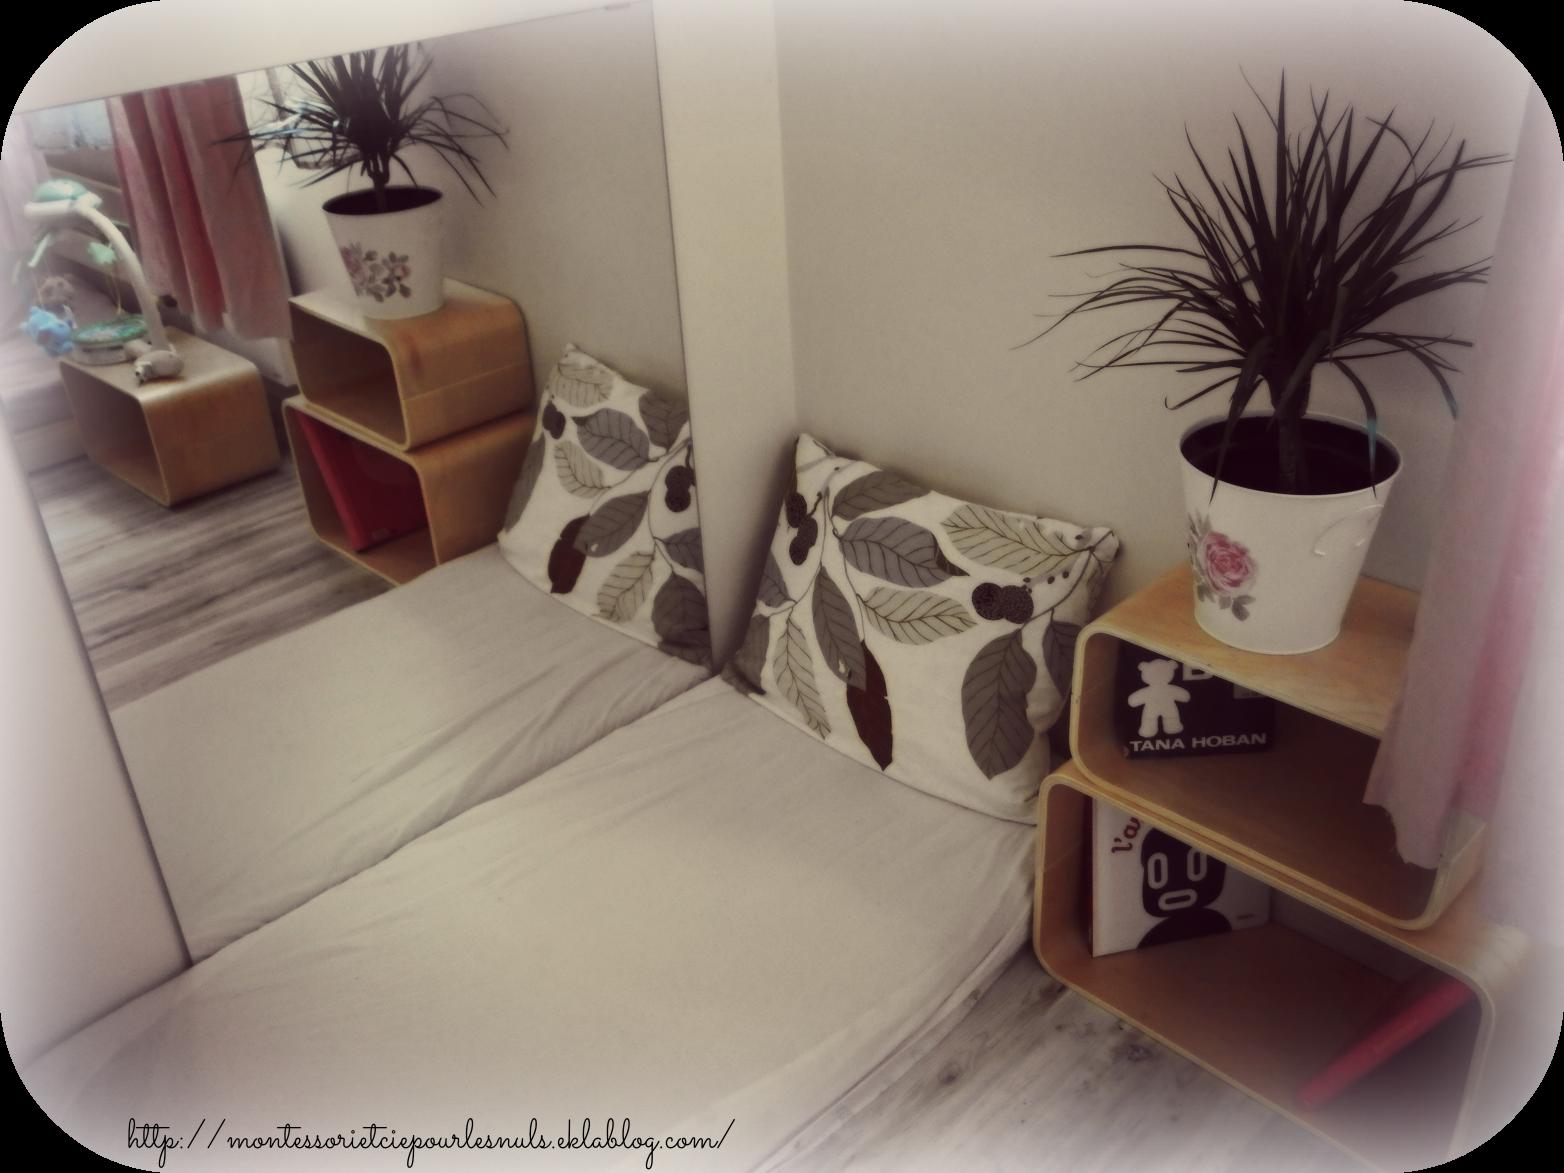 Nido et miroir nido montessori pinterest for Modele chambre montessori